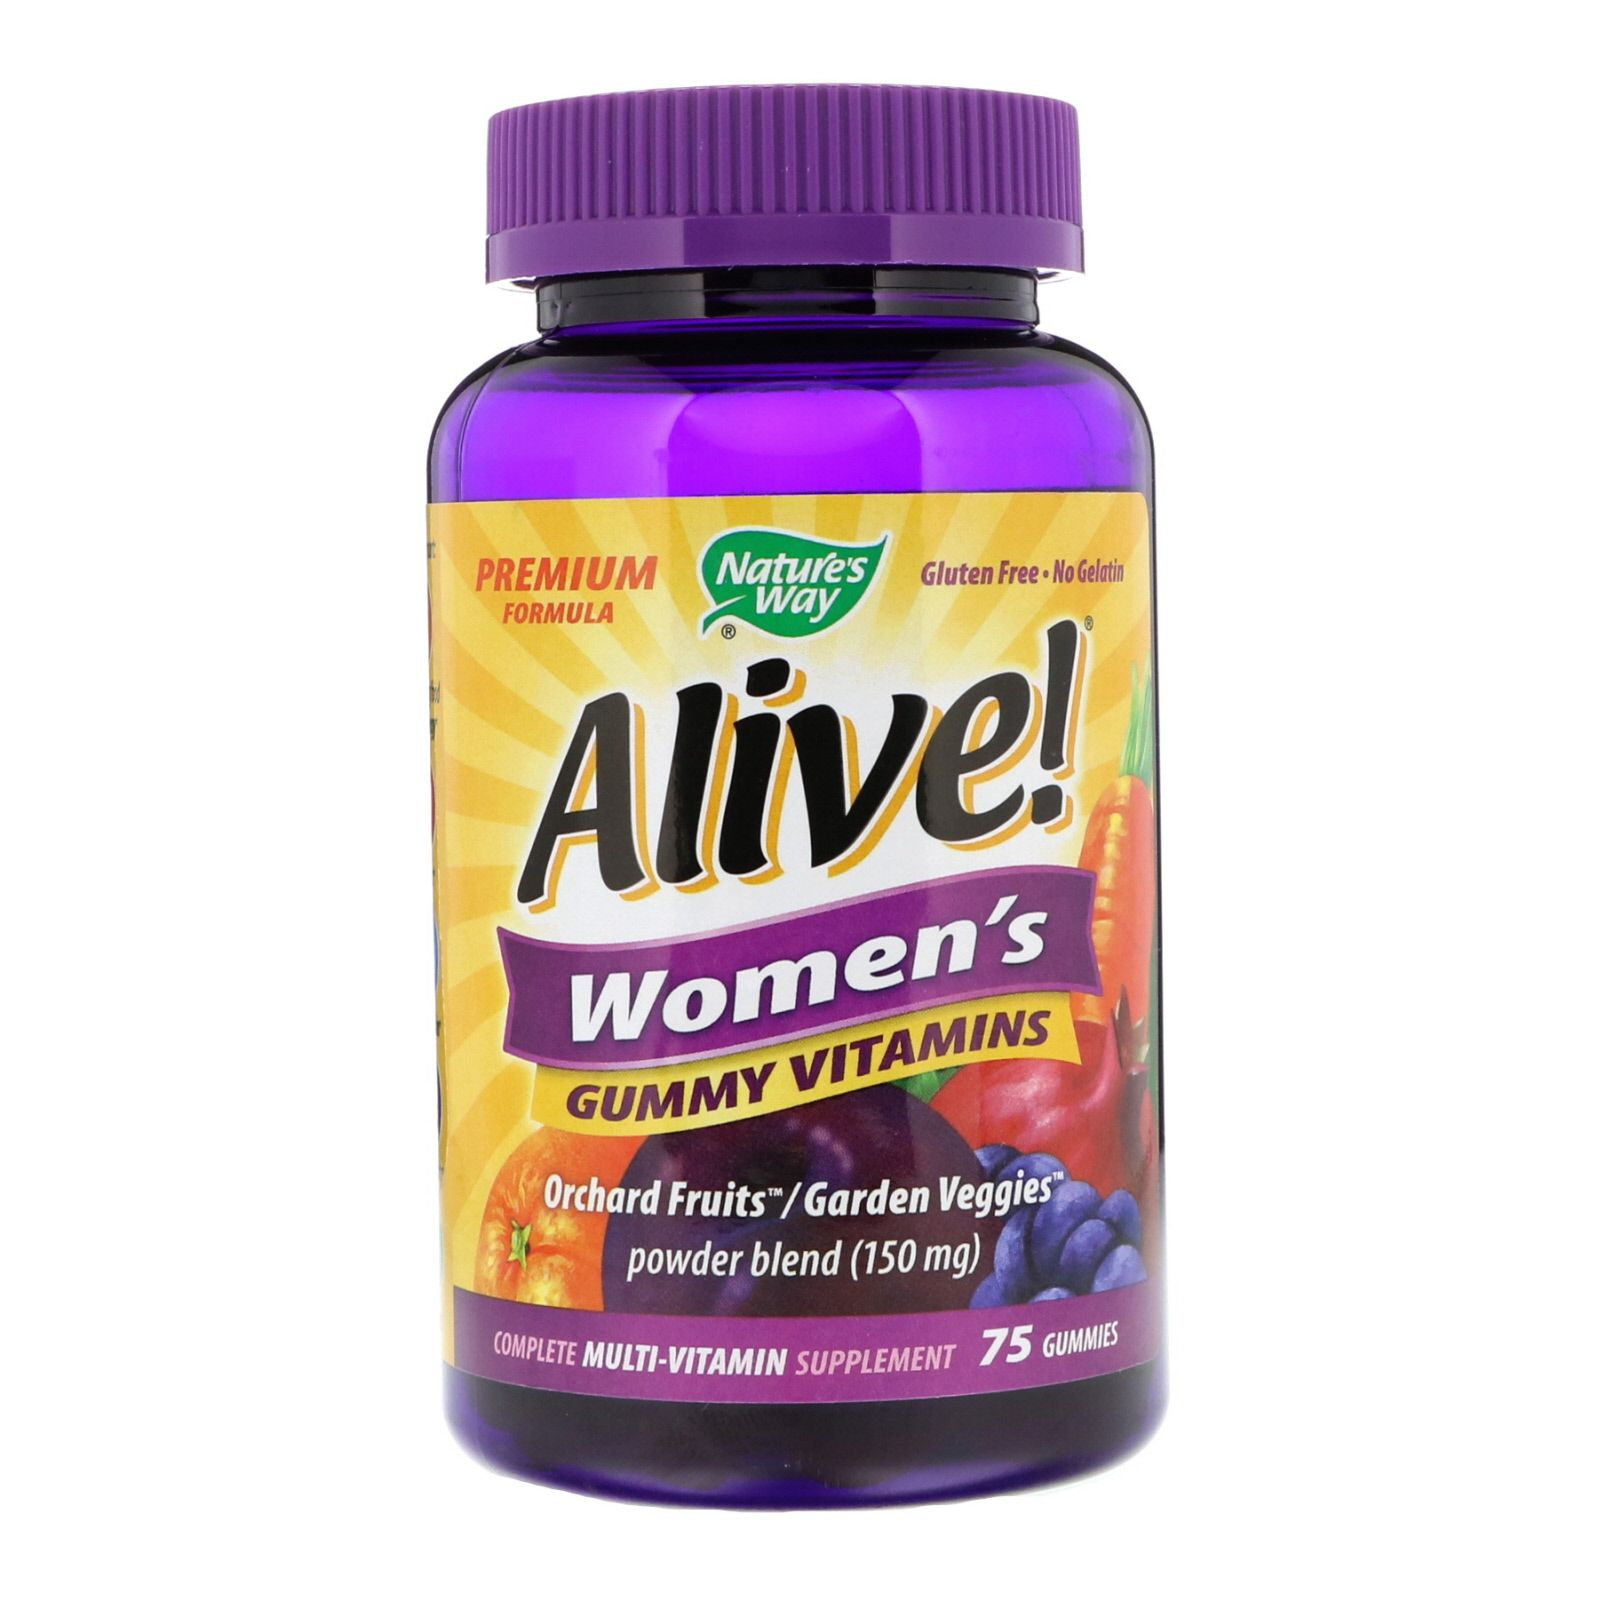 Nature S Way Alive أقراص مضغ فيتامينات متعددة للنساء 75 قرص Vitamins For Women Gummy Vitamins Vitamins